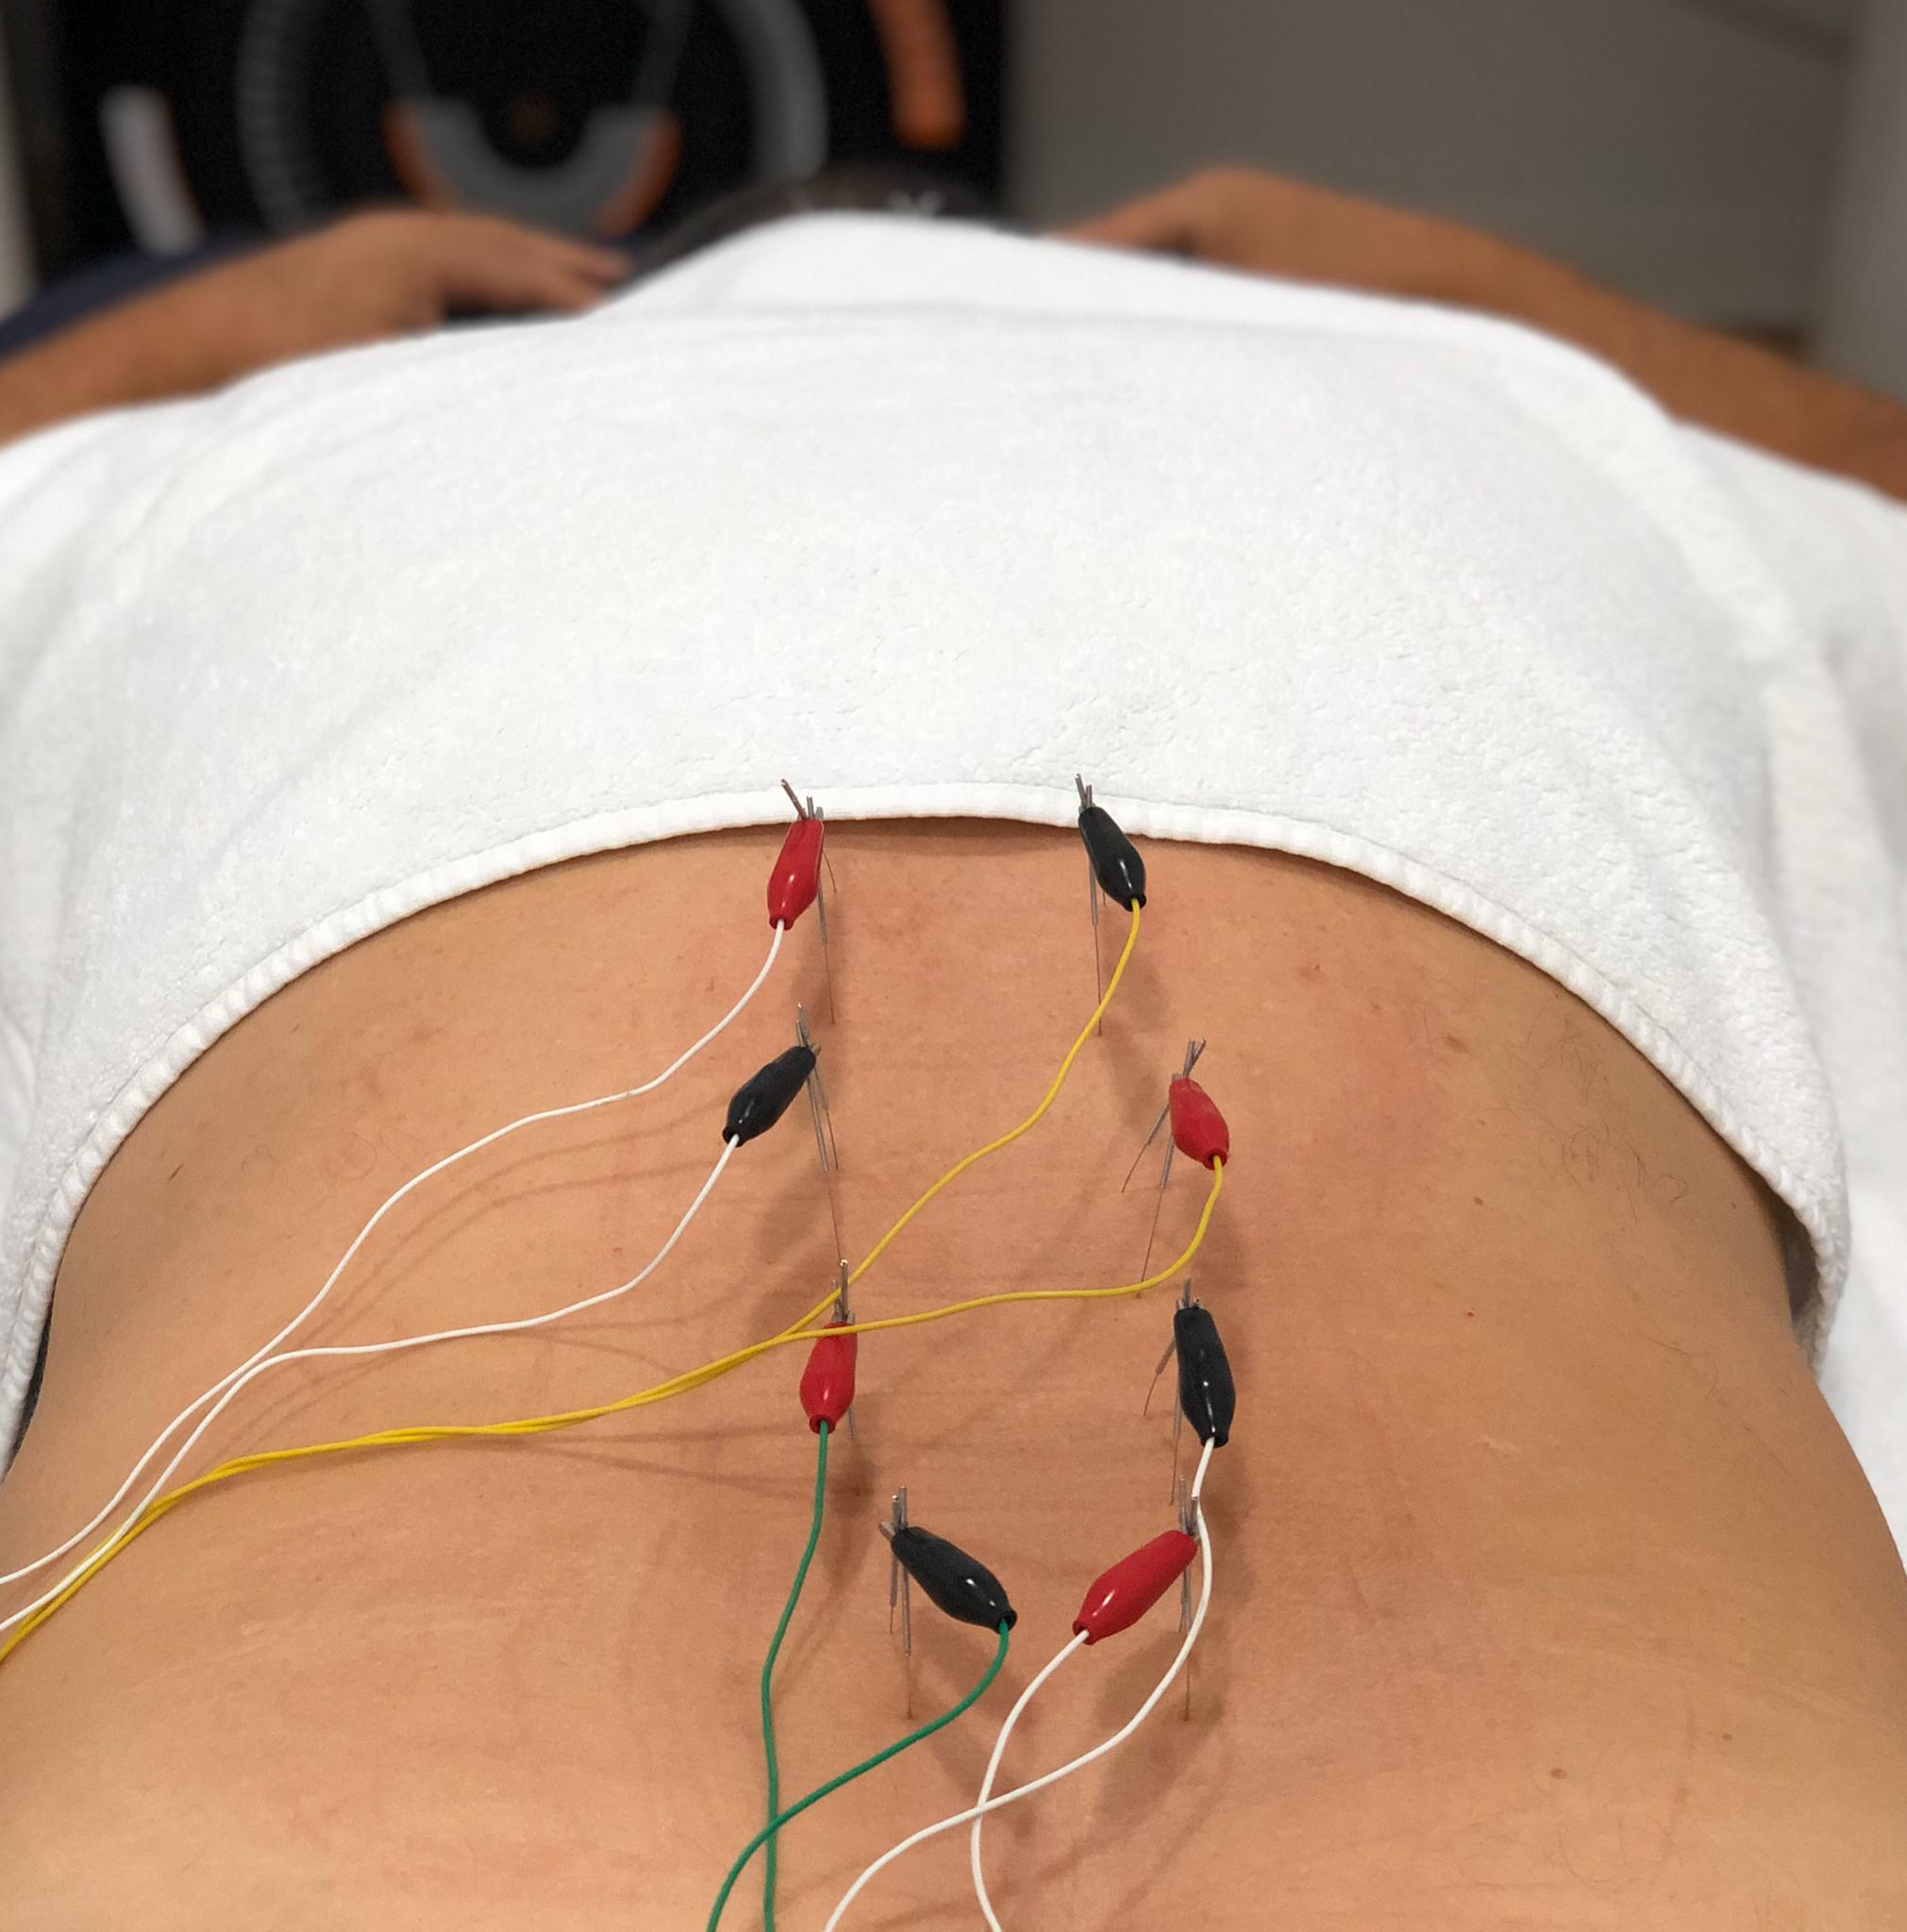 neuromodulacion-funcional-doctor-blas-ramon-martinez